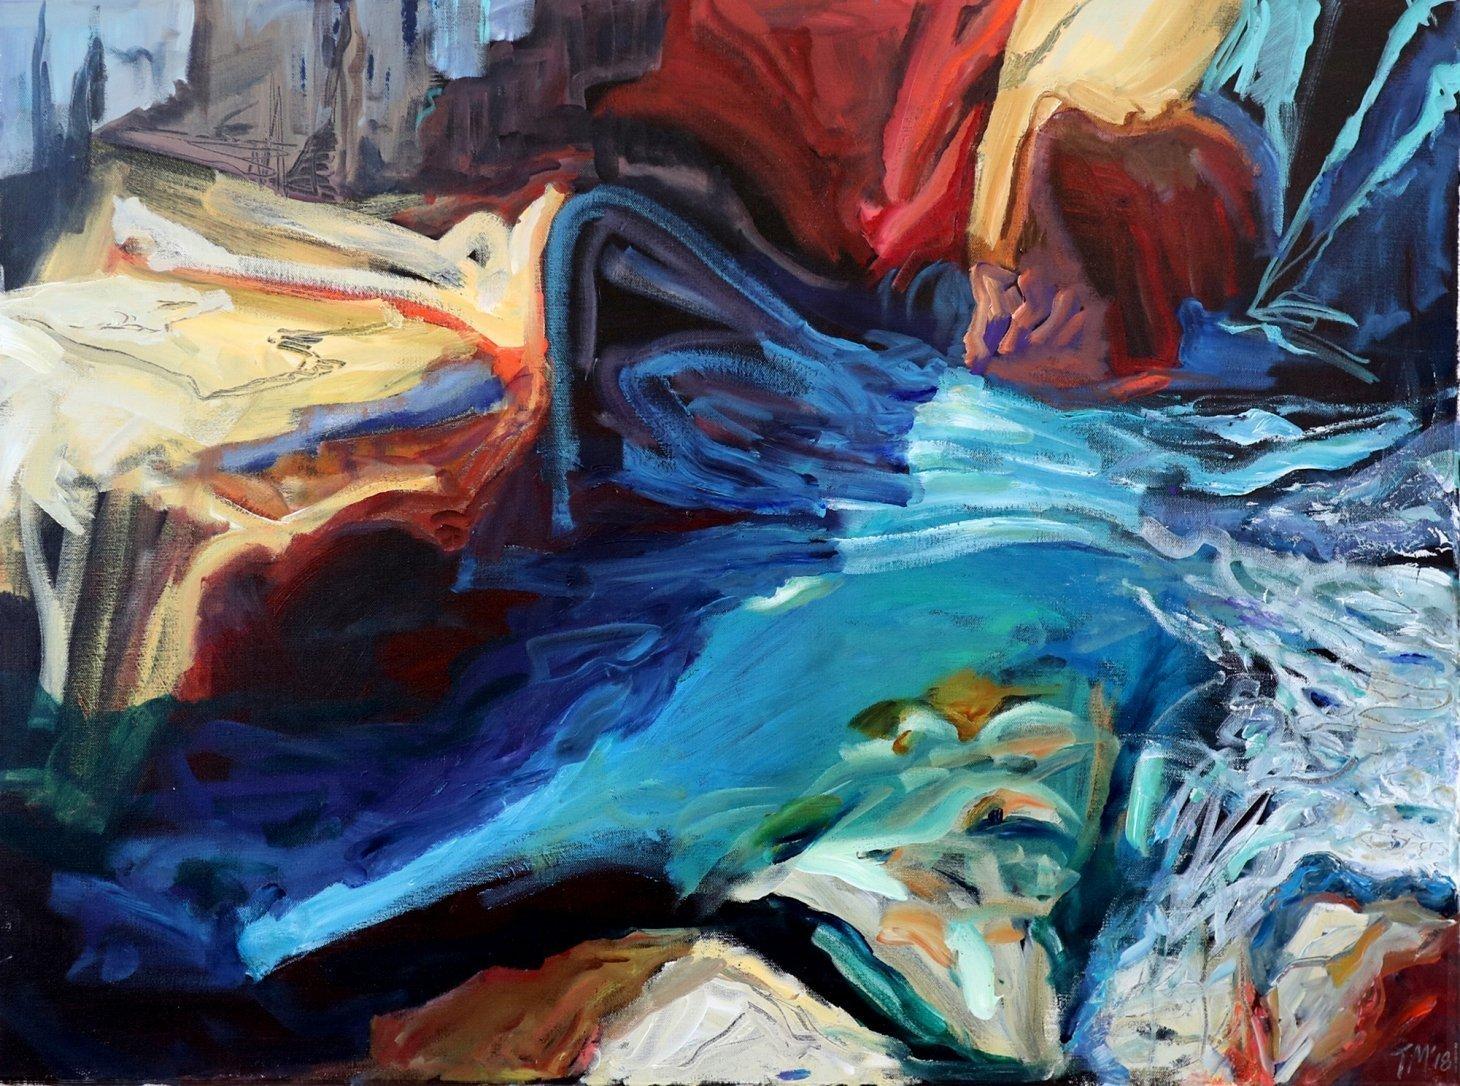 Buy Cornish Art Tony Minnion At The Base Of The Cliff Cligga Cove Primary 1